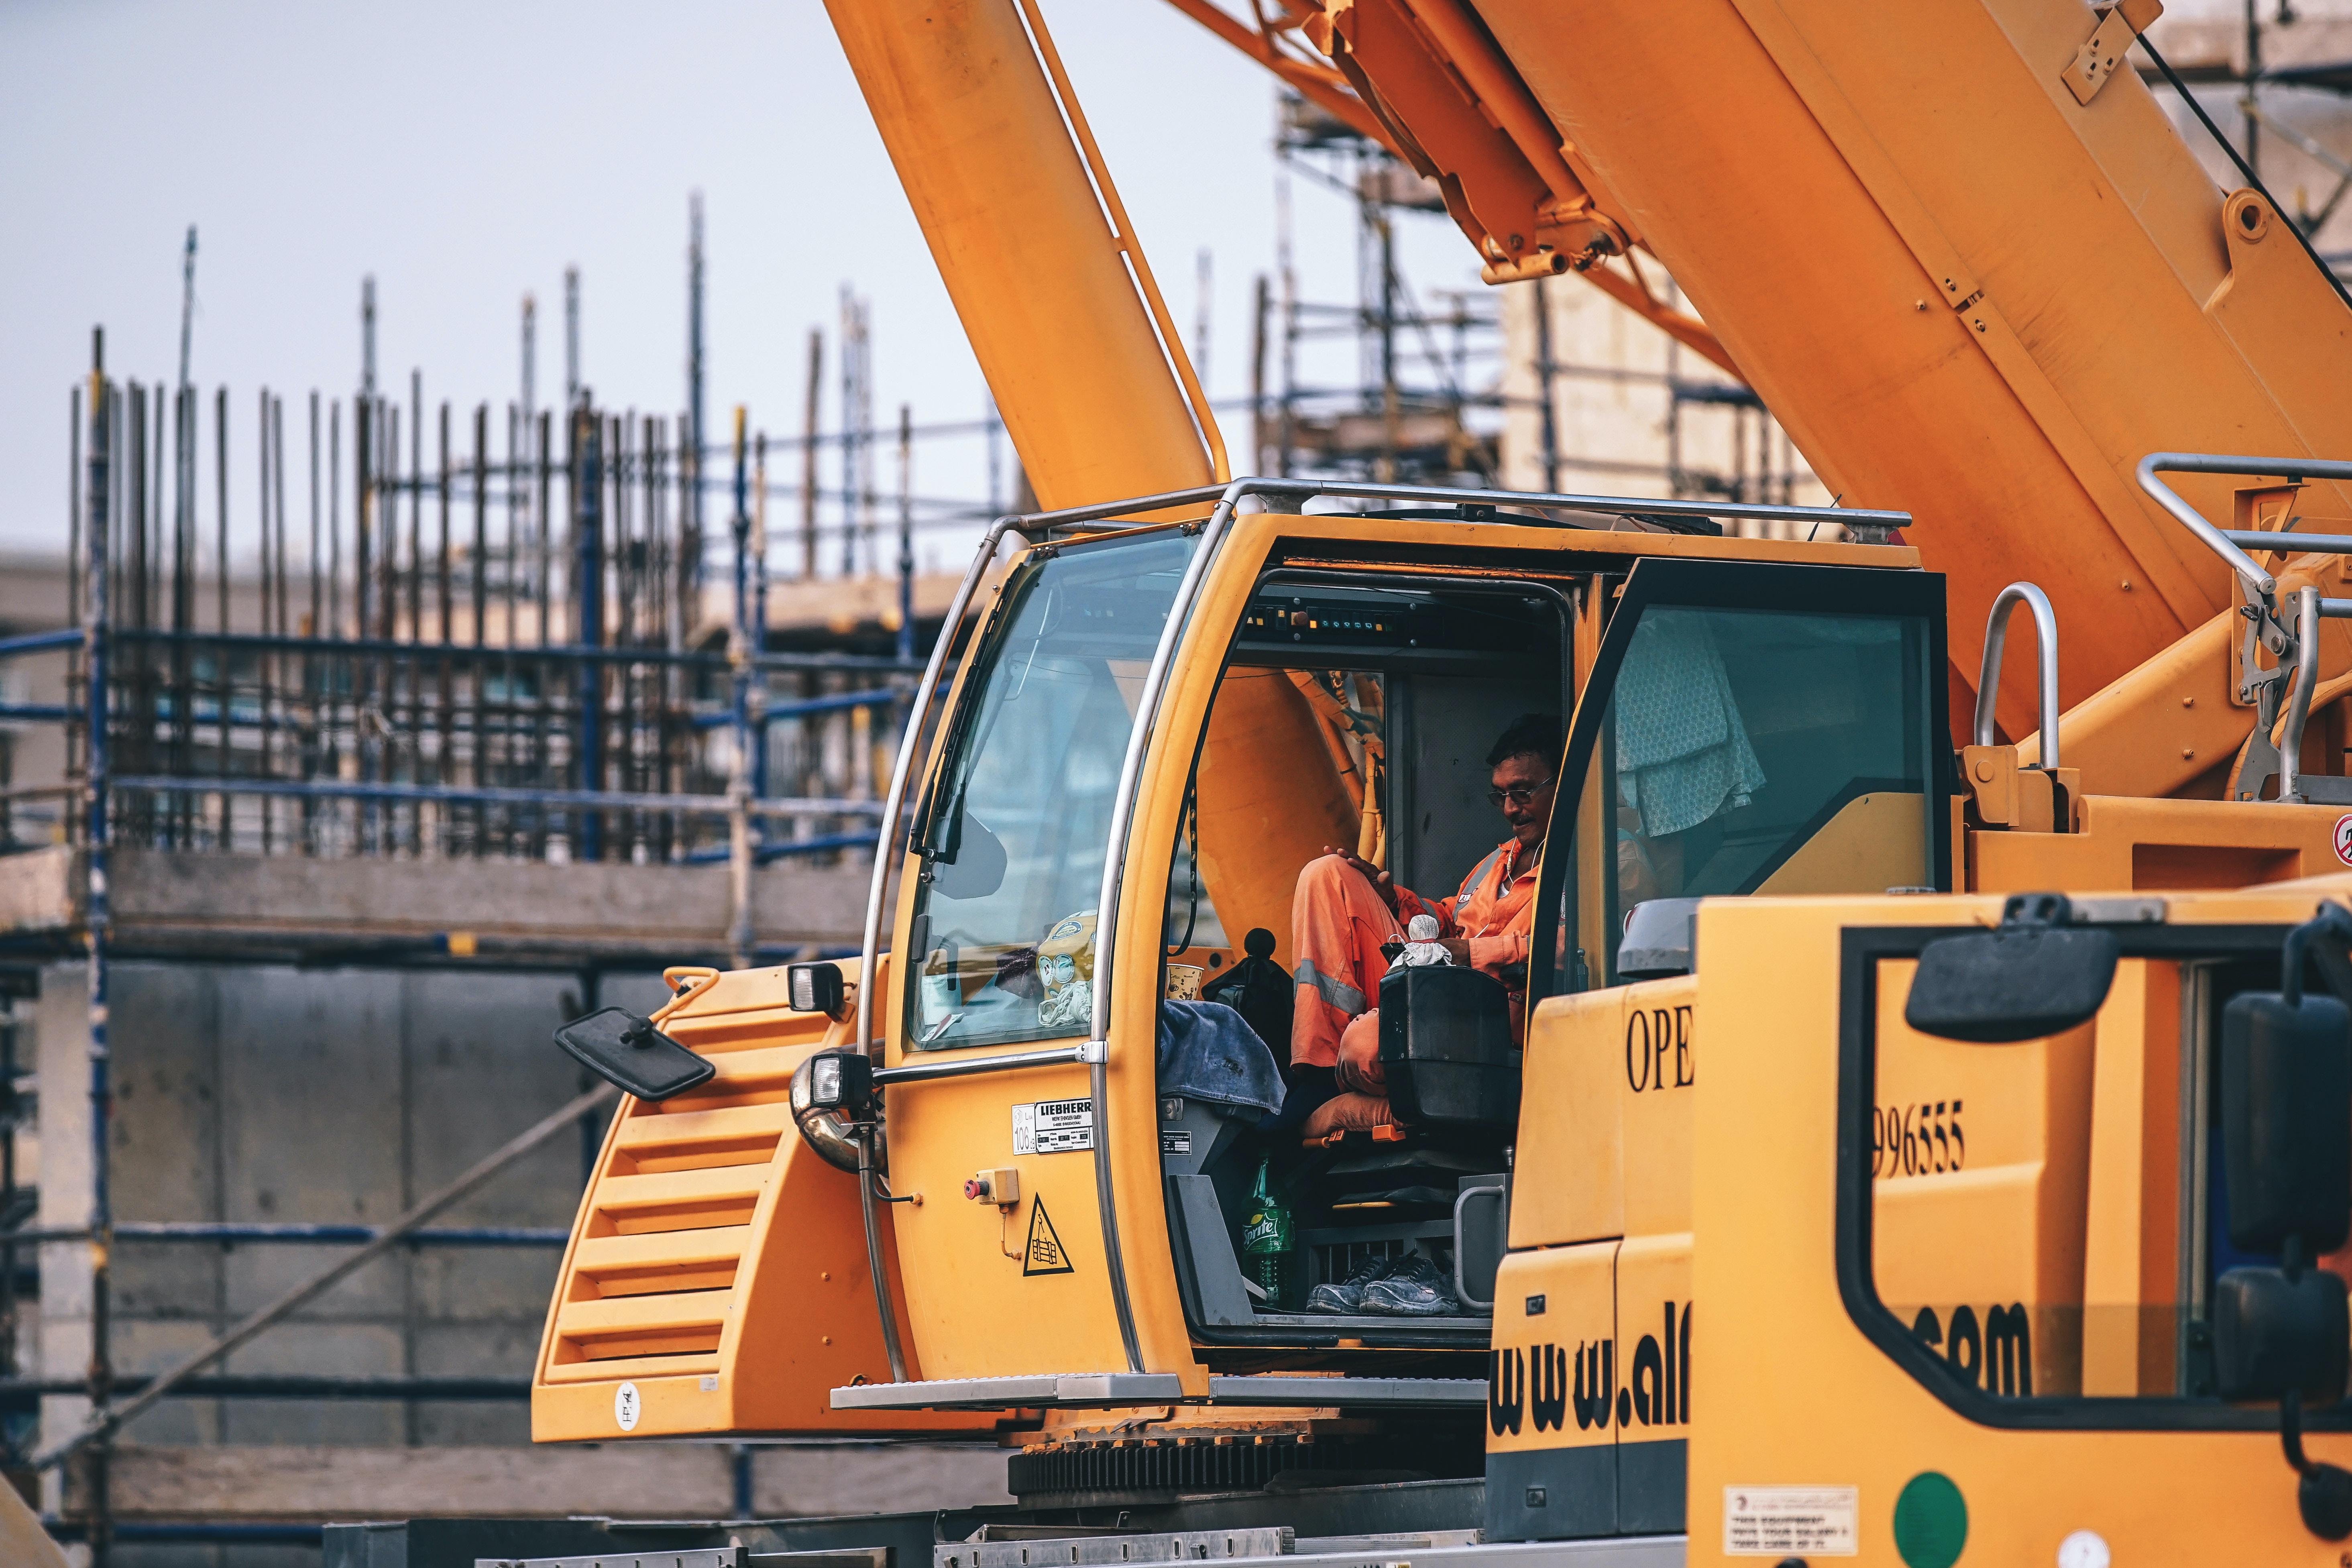 man riding orange heavy equipment at daytime